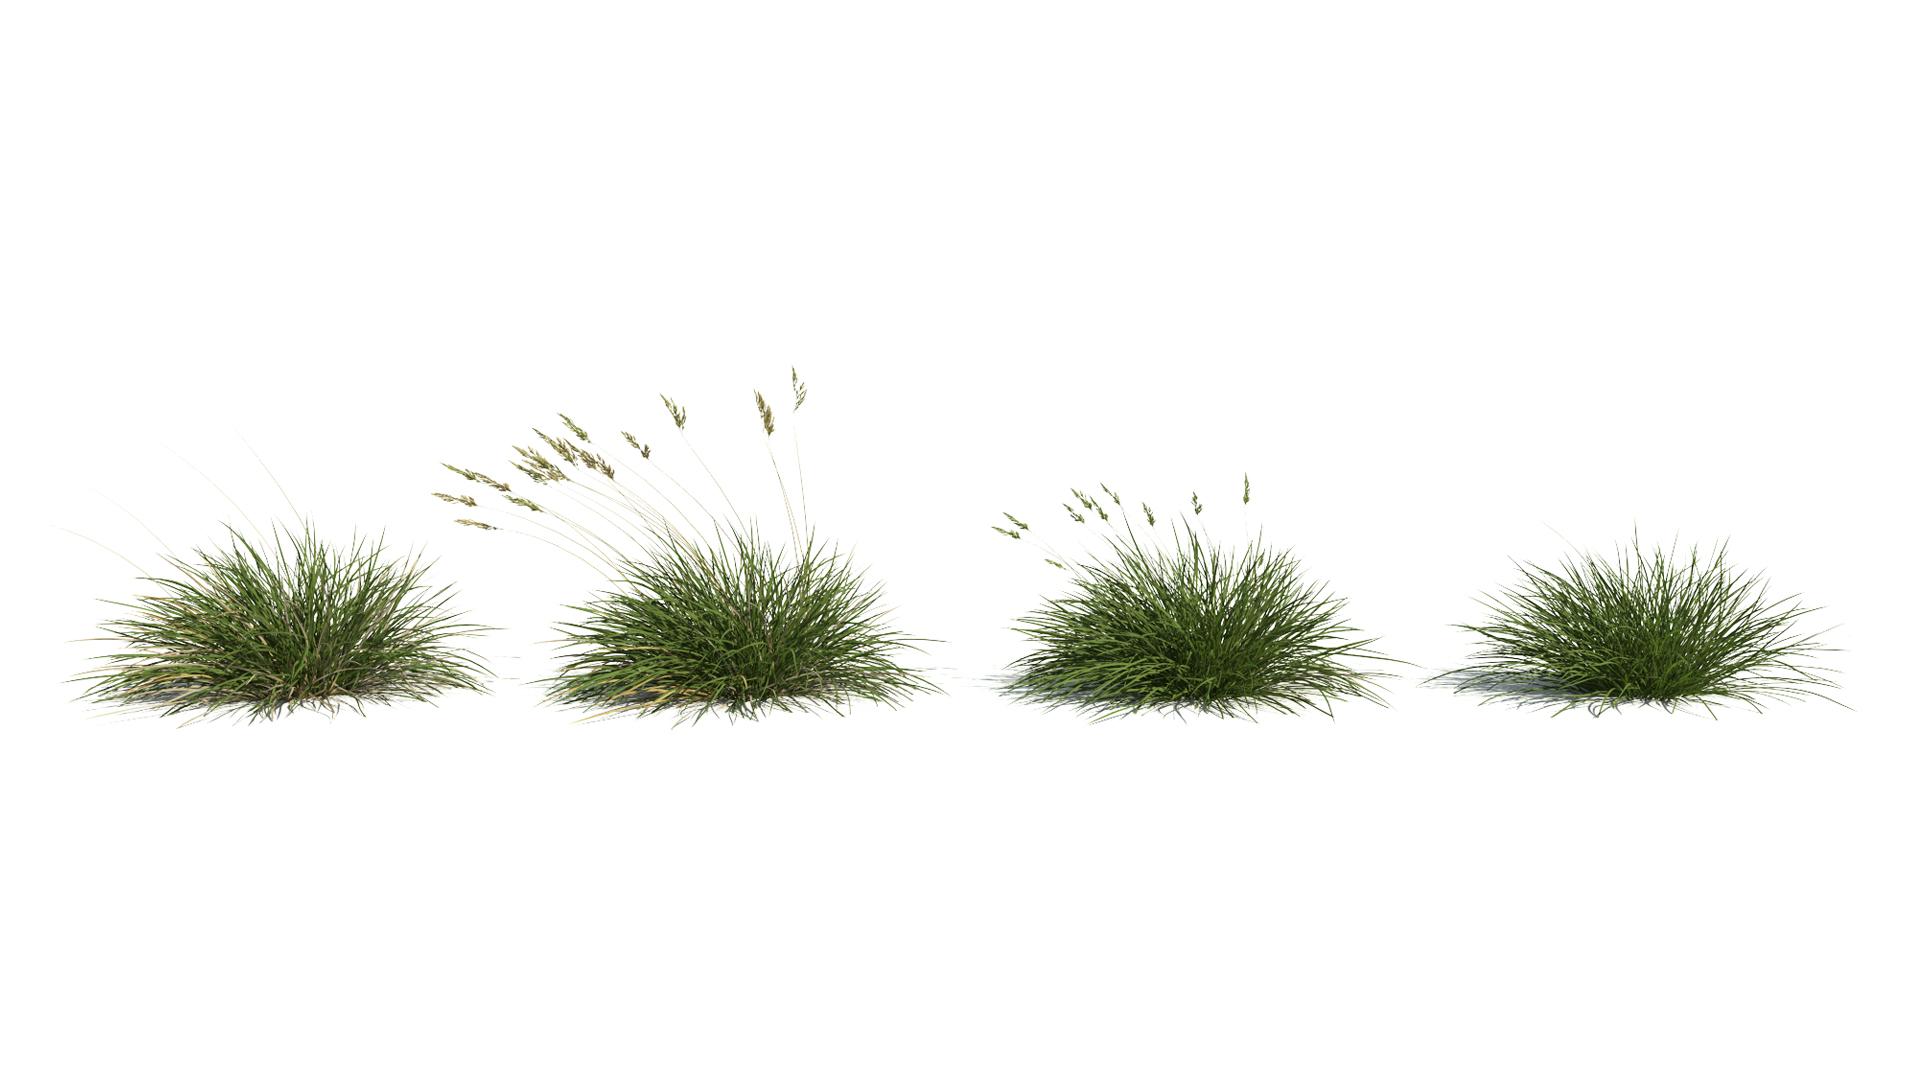 3D model of the Spiky fescue Festuca gautieri season variations